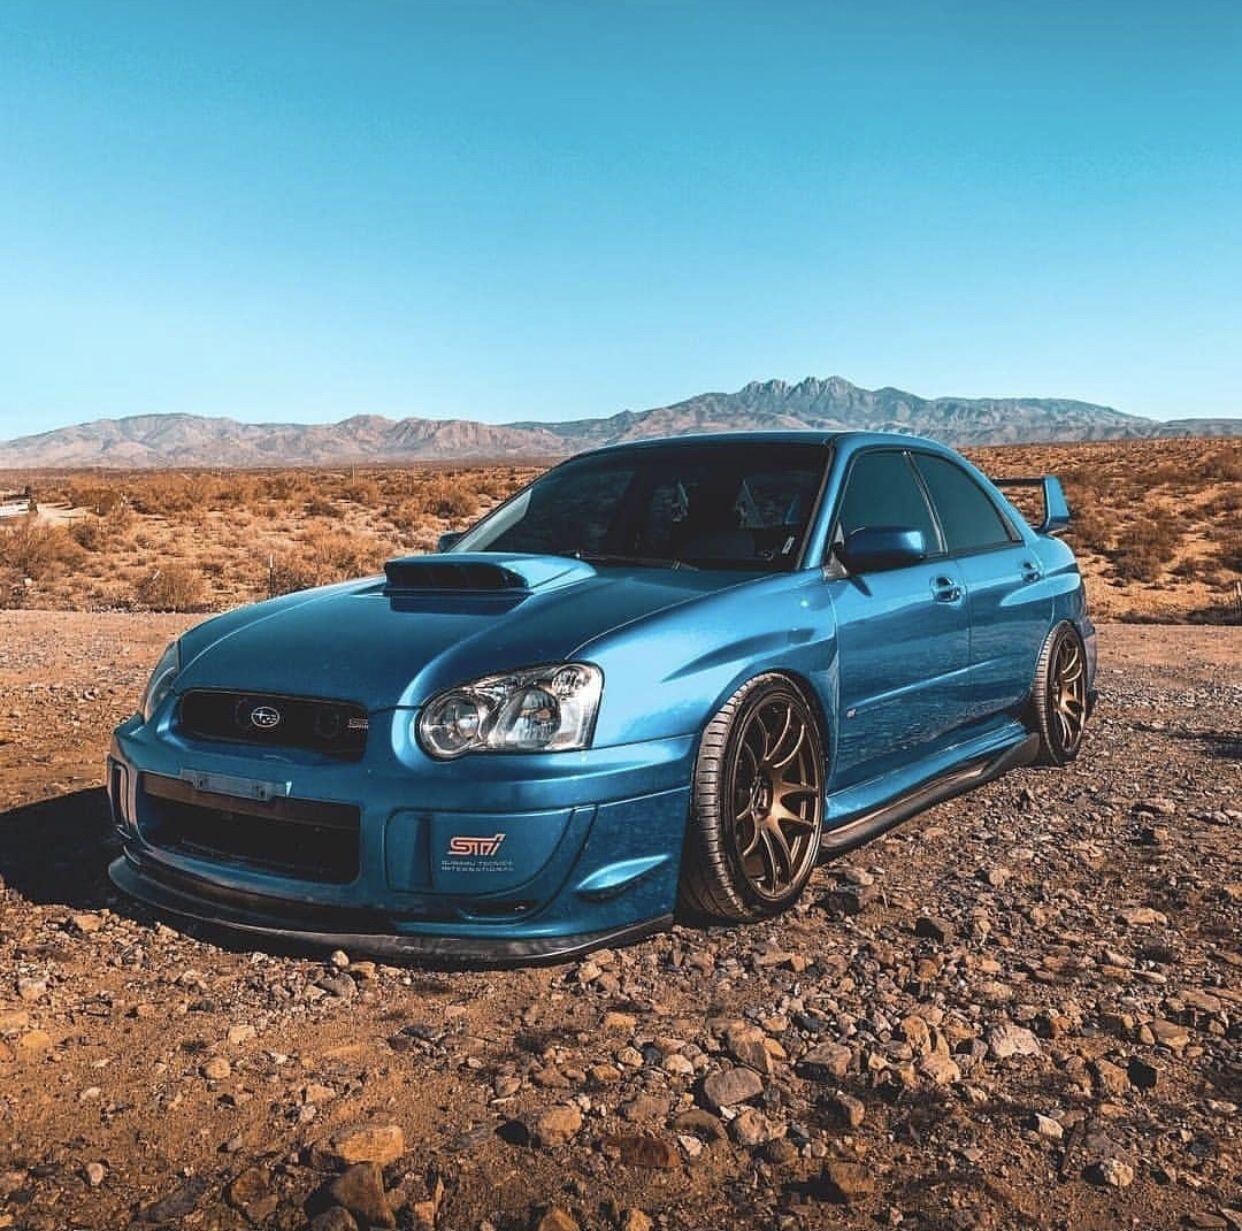 Pin By Joseph Cline On Subaru